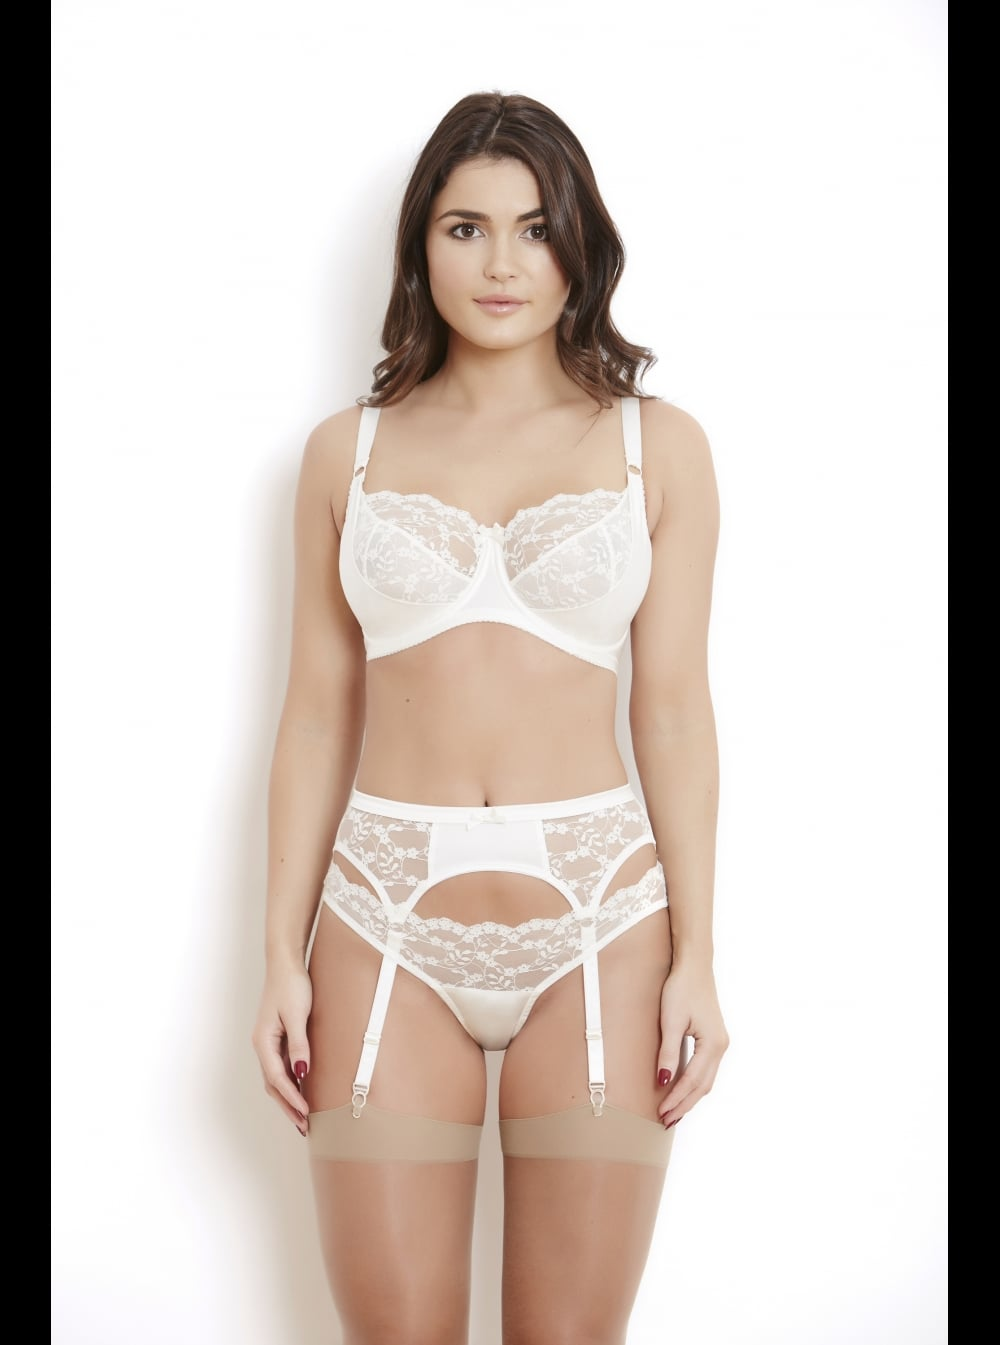 b5732077b843 Katherine Hamilton Intimates | Sophia Ivory Bra - Honeys Lingerie